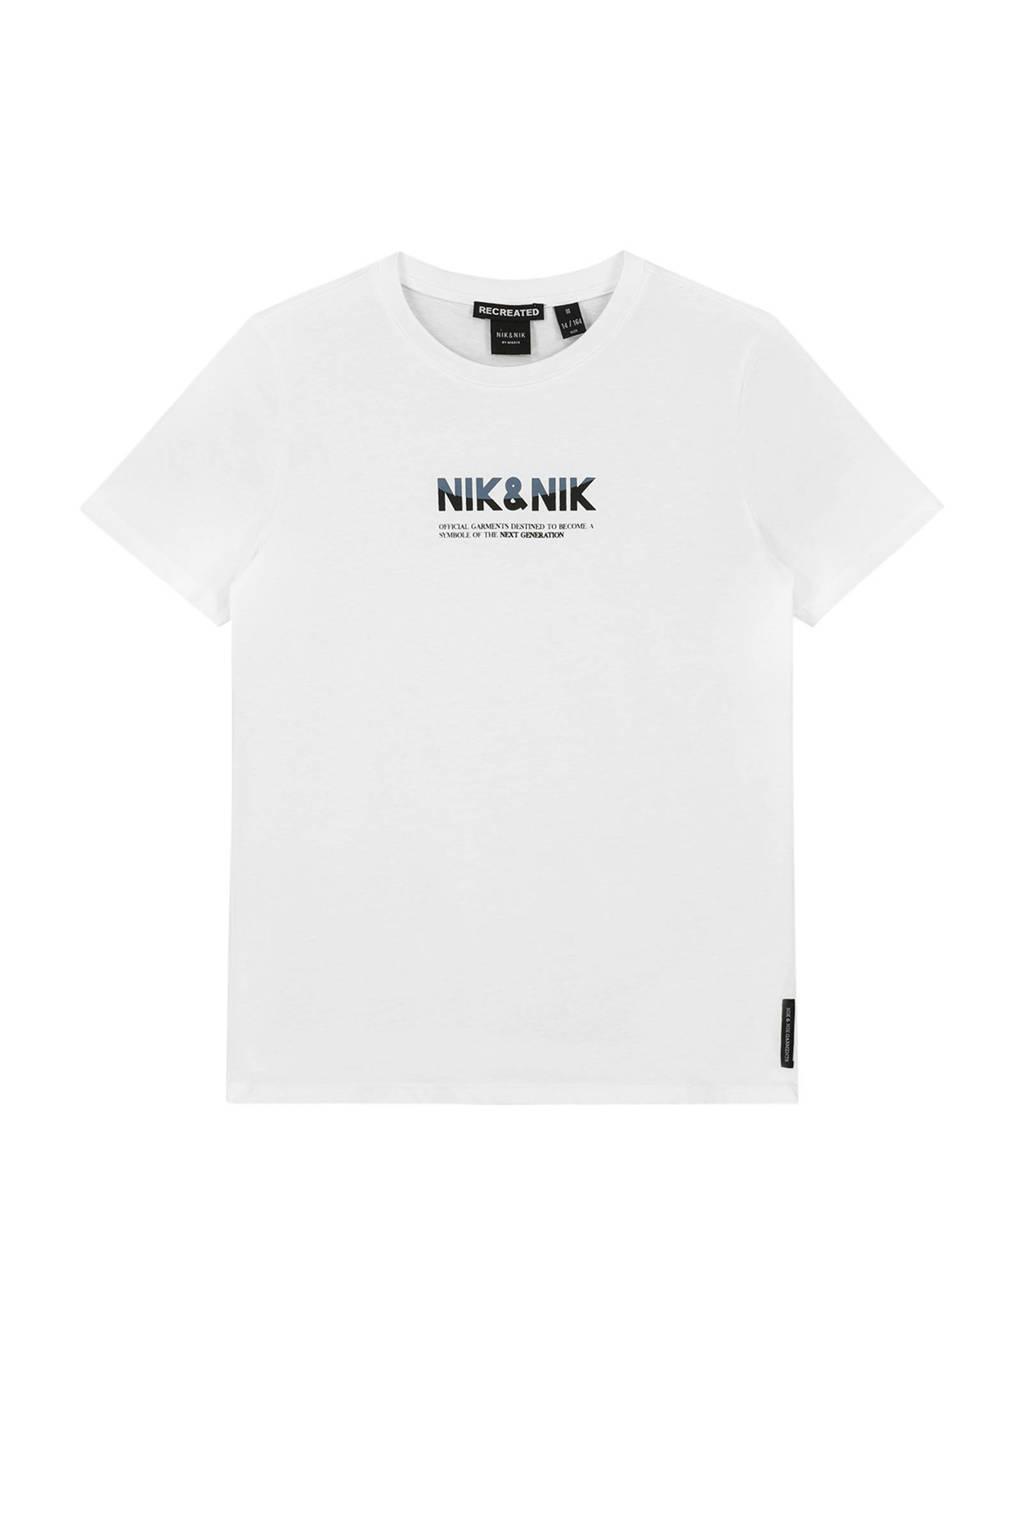 NIK&NIK T-shirt Lenox met logo off white, Off White